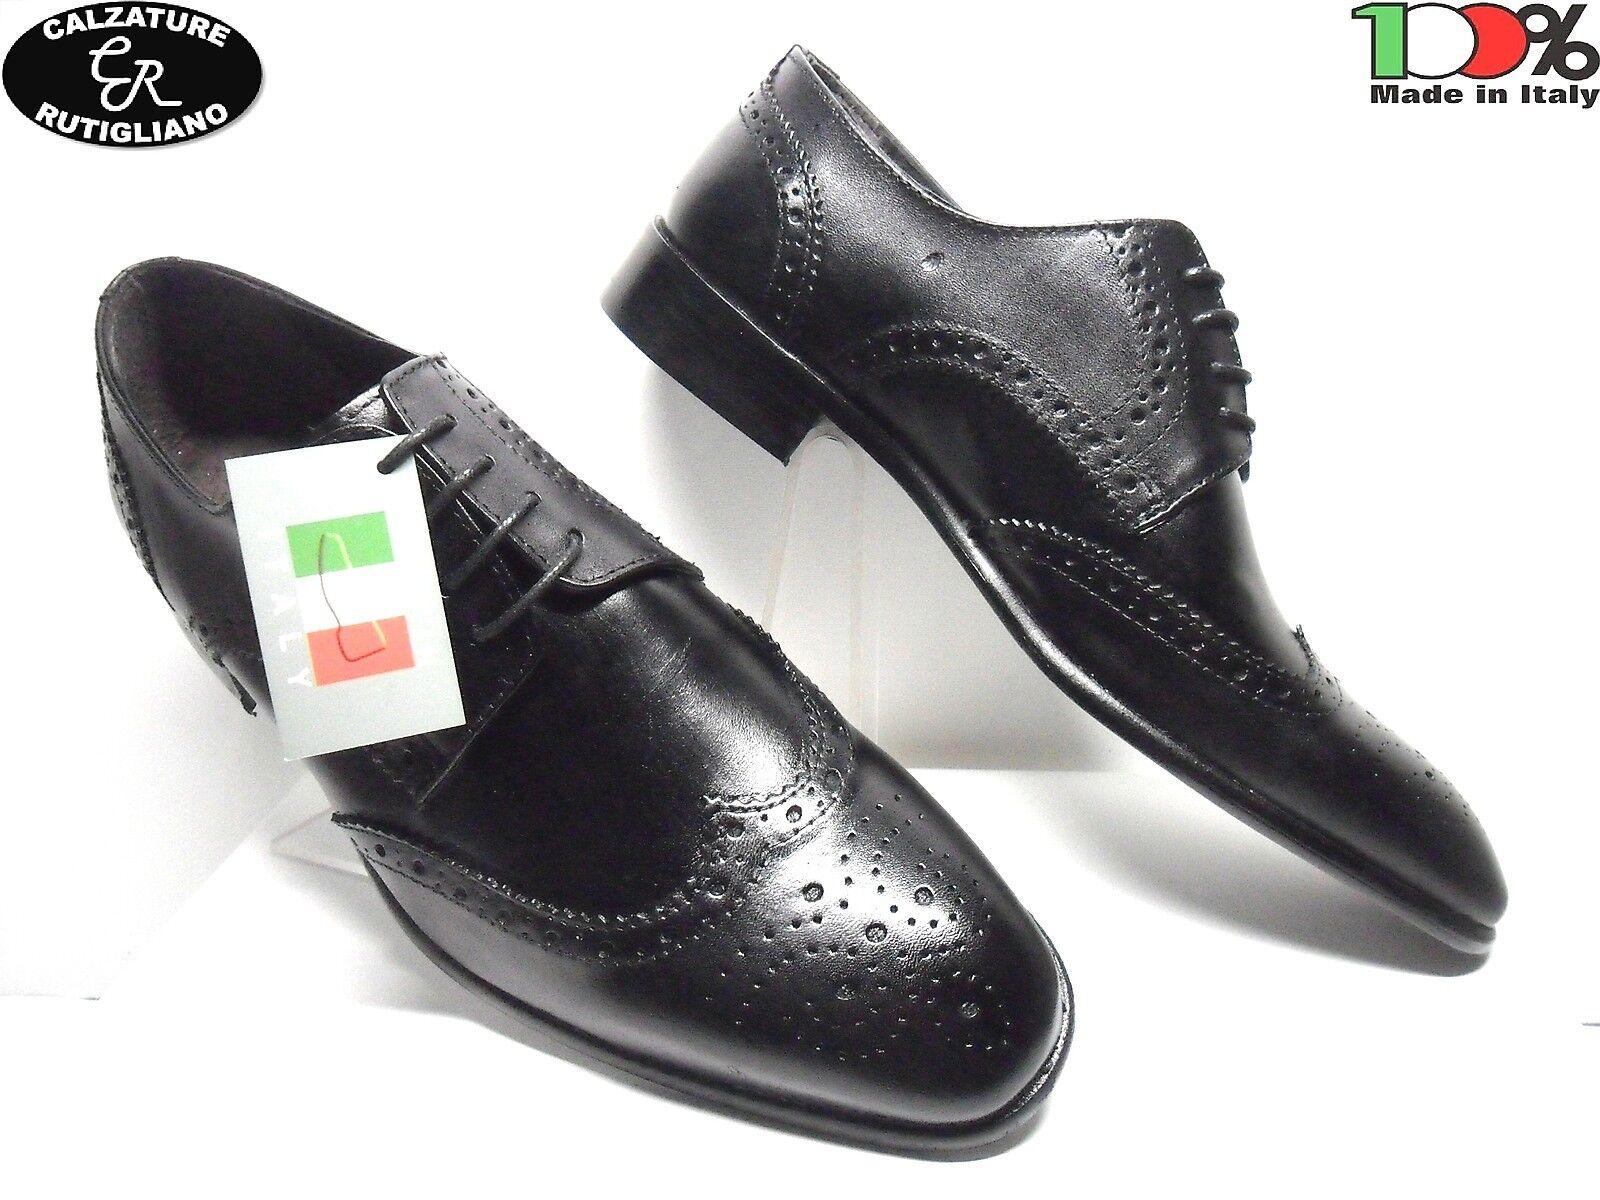 CENTRO STRADA chaussures ELEGANTI hommes MODELLO INGLESE IN PELLE noir - 1710